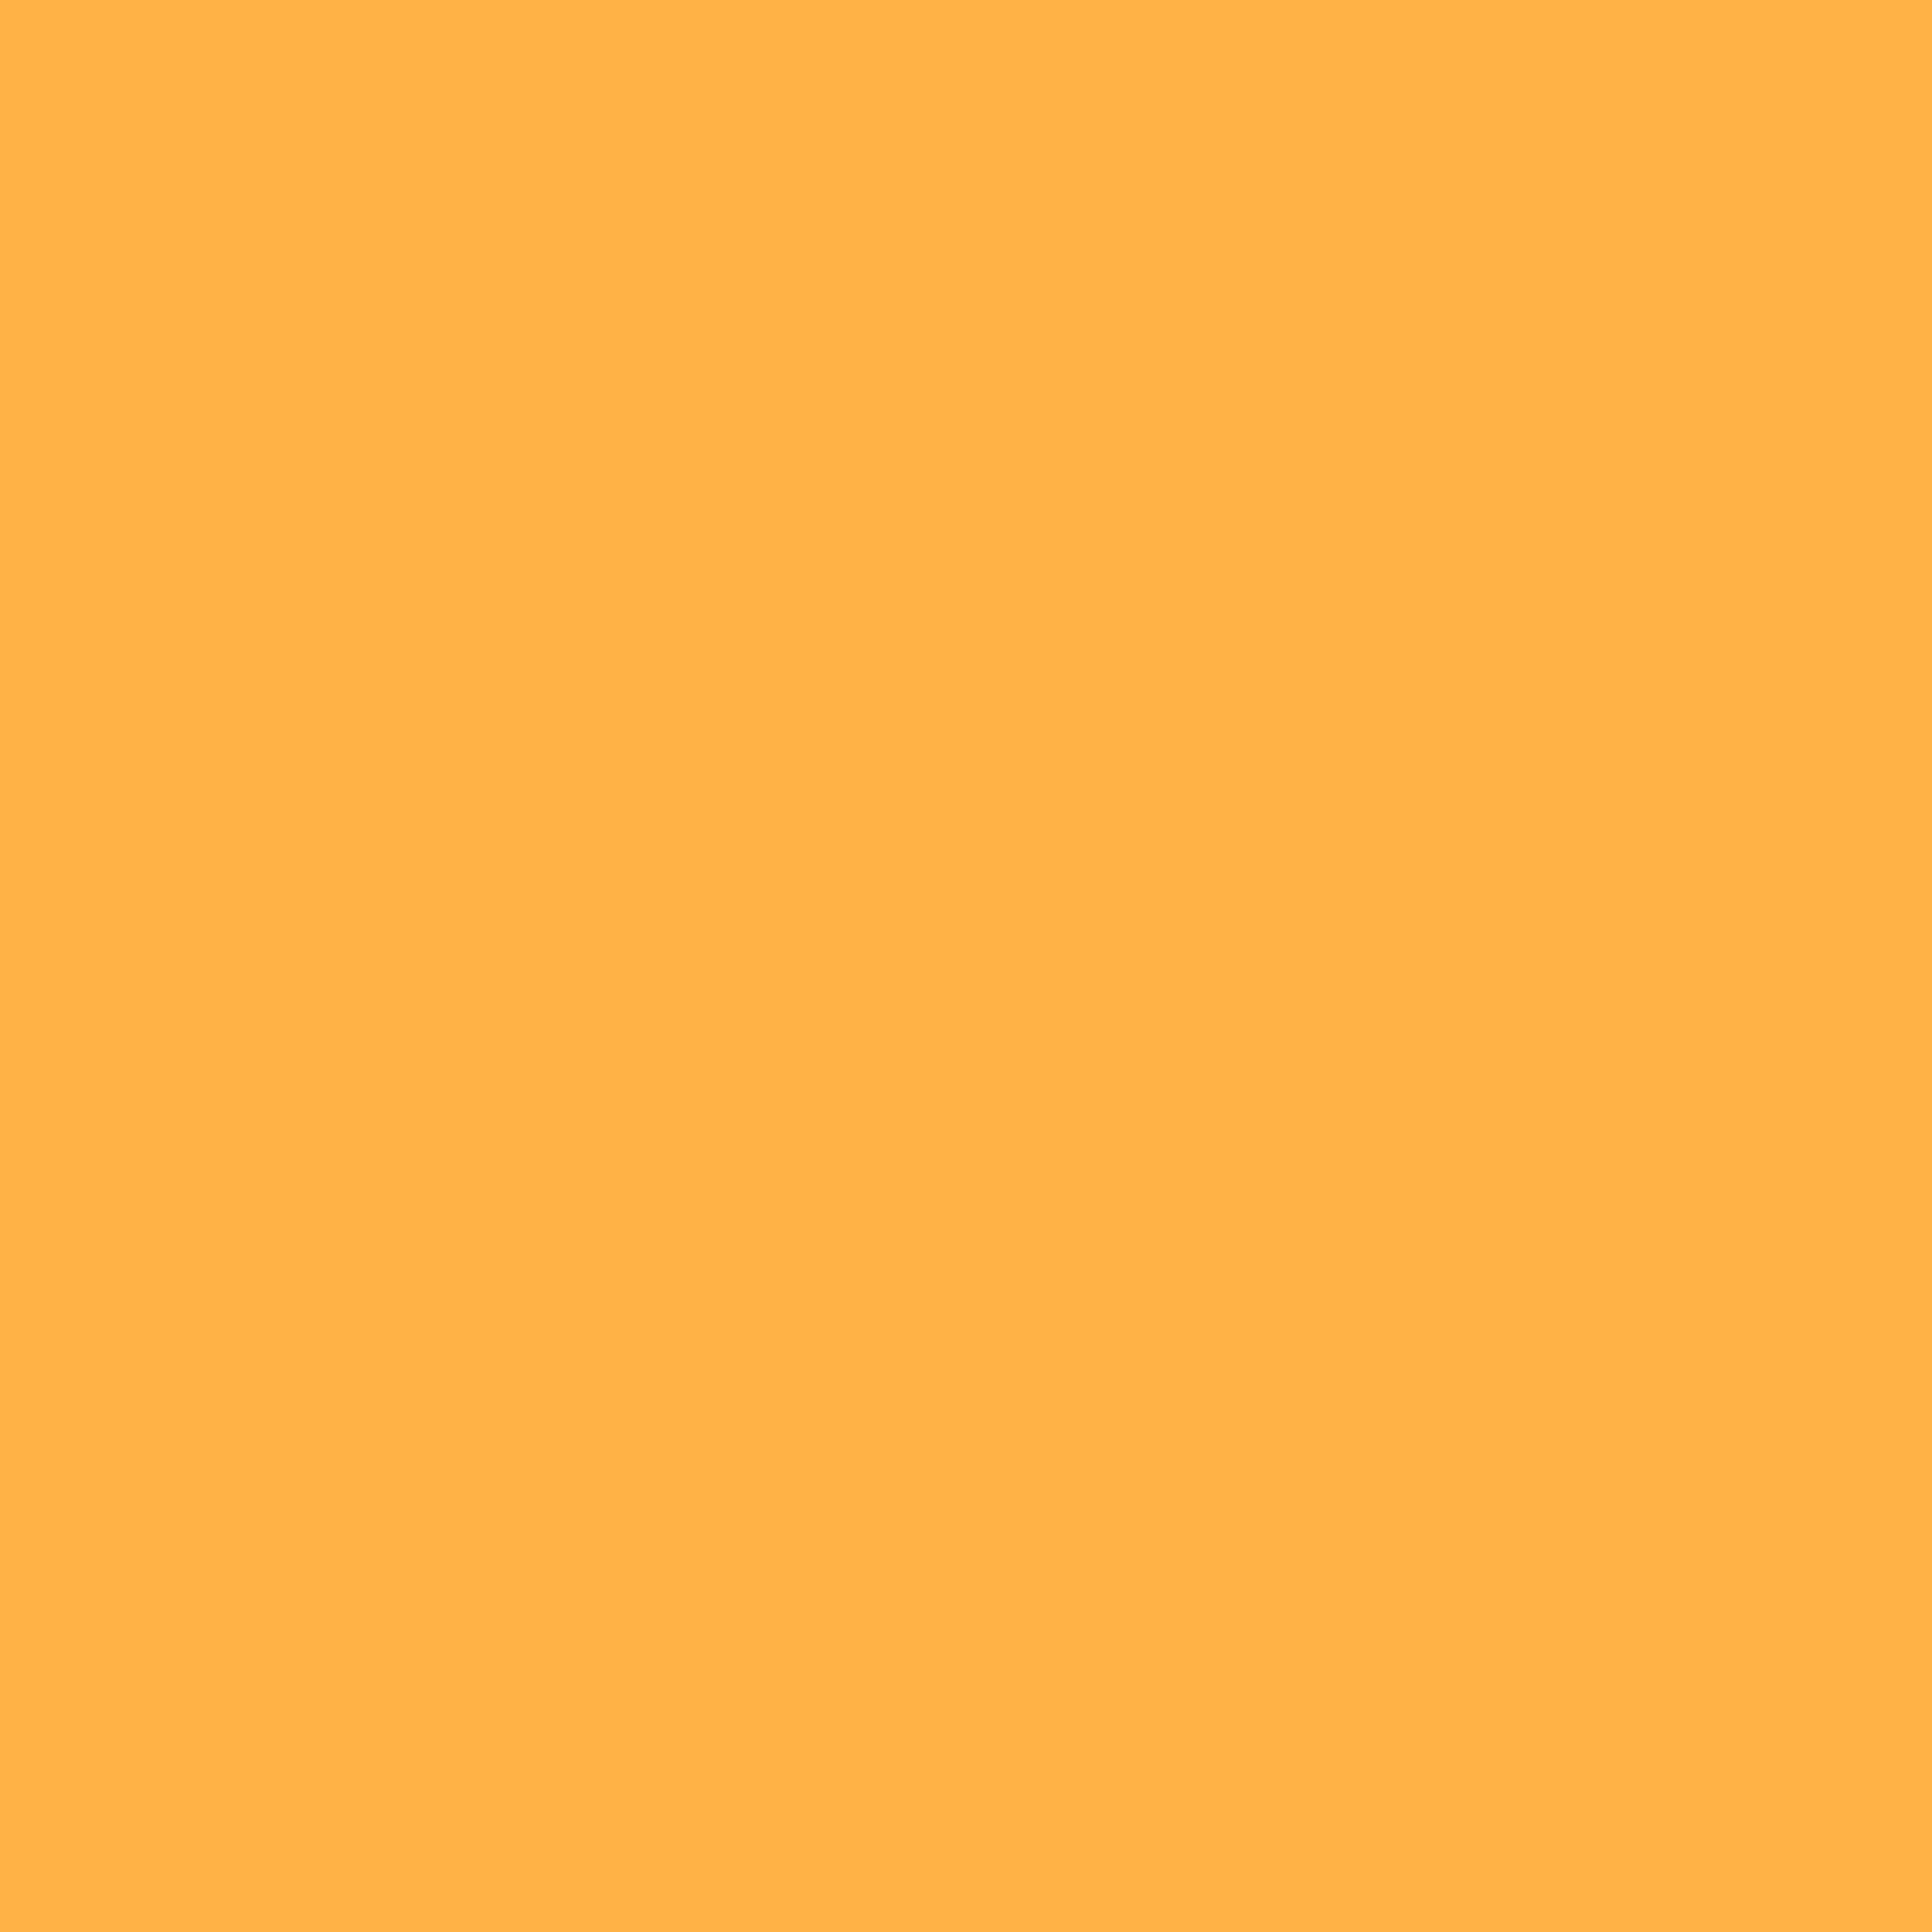 3600x3600 Pastel Orange Solid Color Background